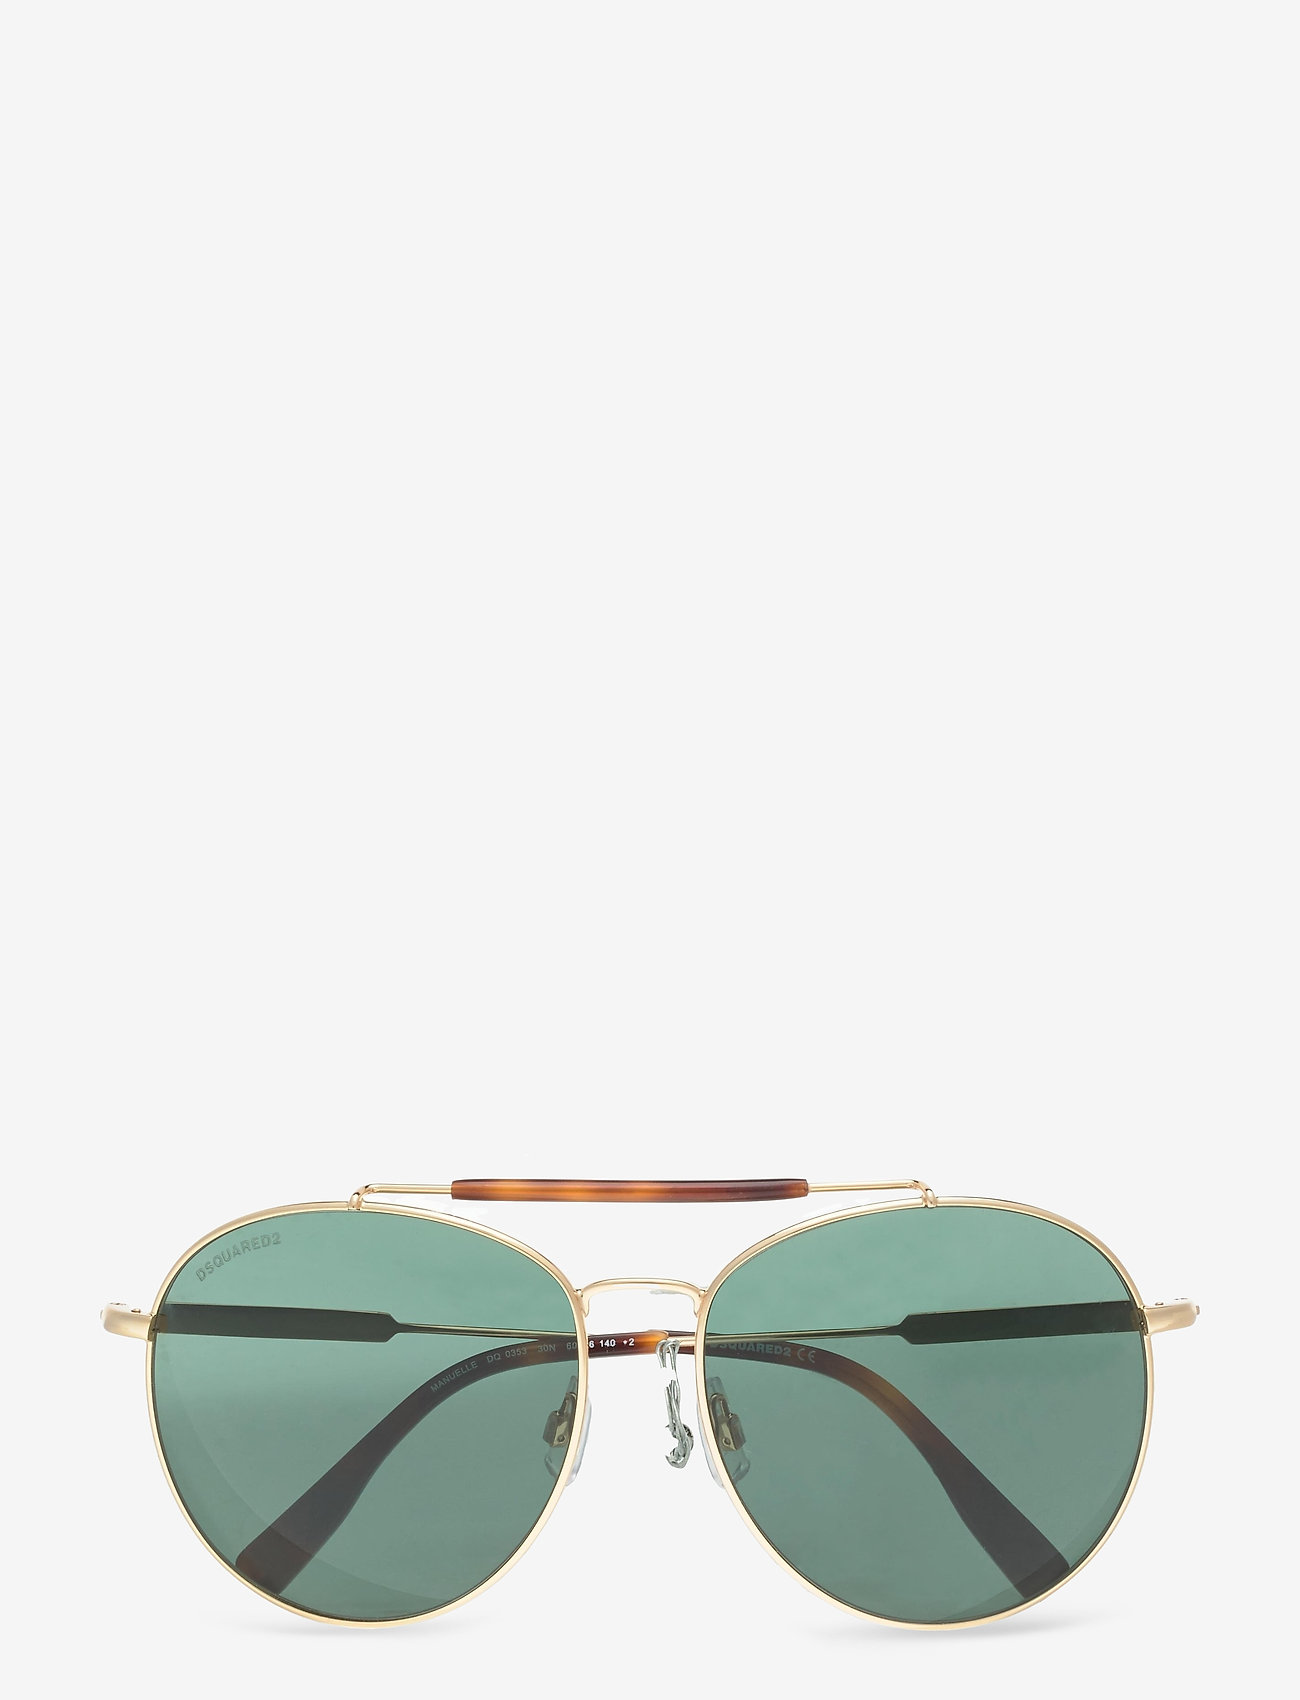 DSQUARED2 Sunglasses - MANUELLE - pilot - shiny deep gold - 0